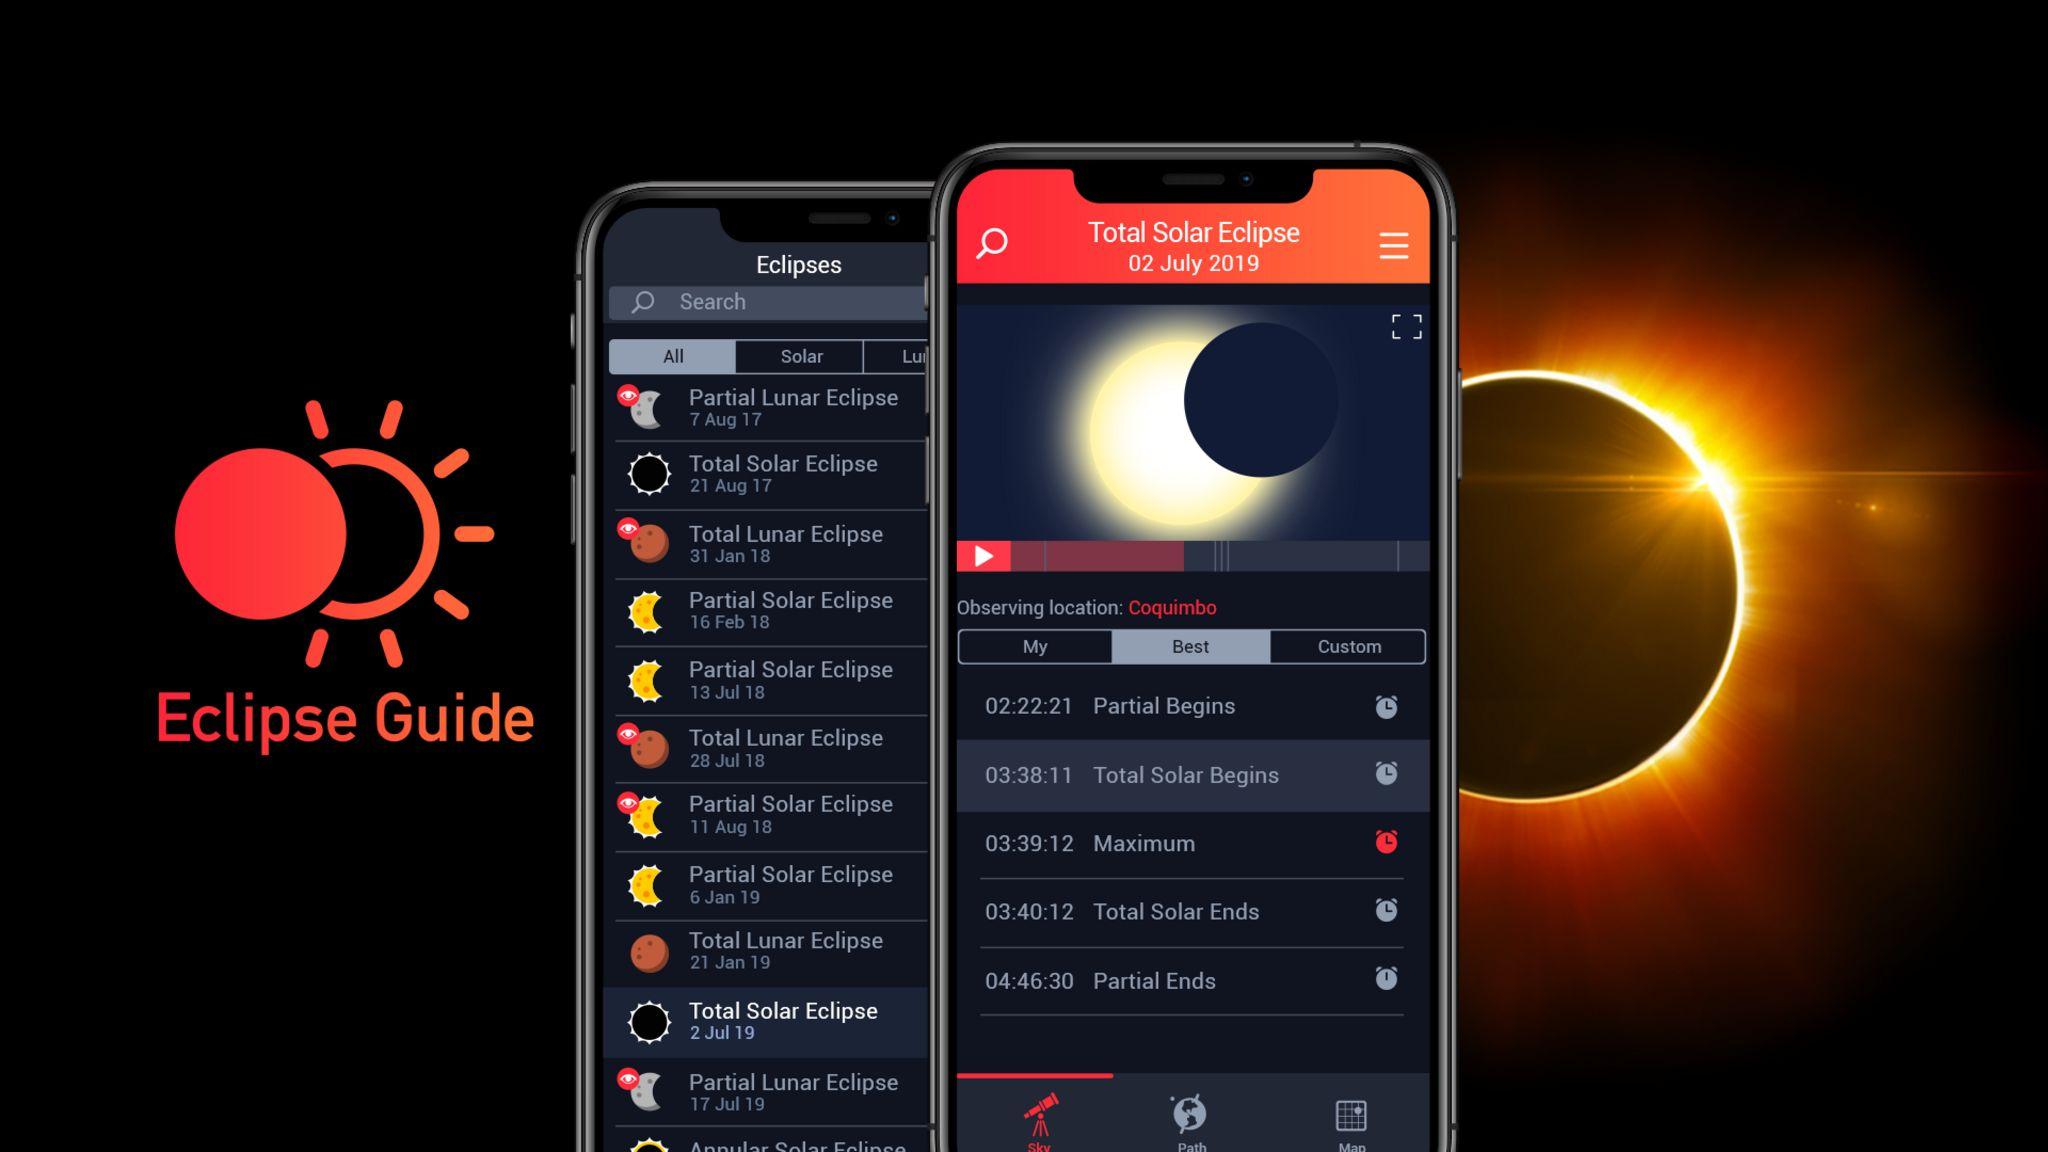 Actualización importante de Eclipse Guide